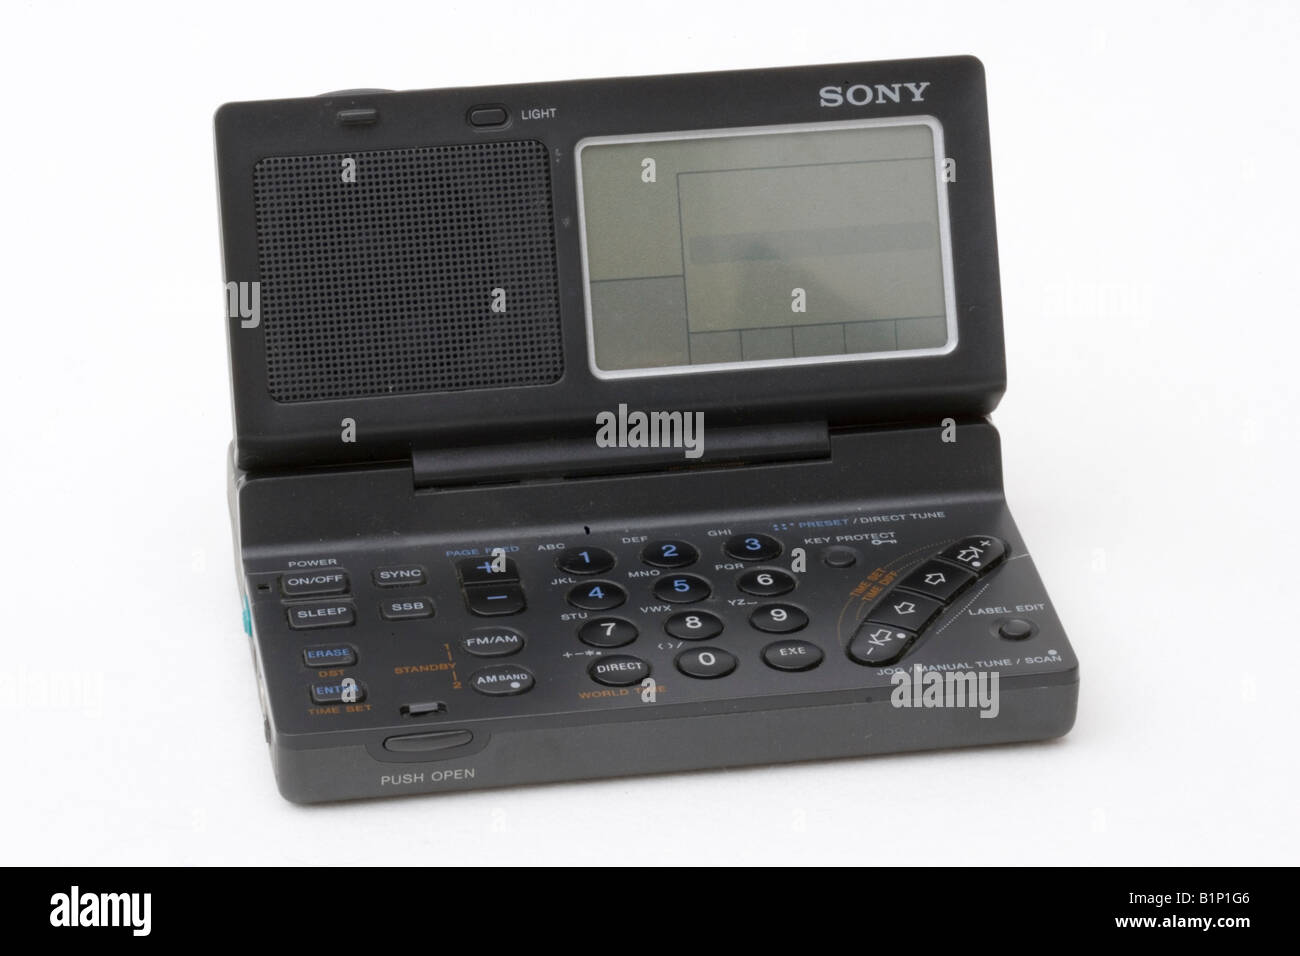 Miniature Sony pocket world radio UK Stock Photo